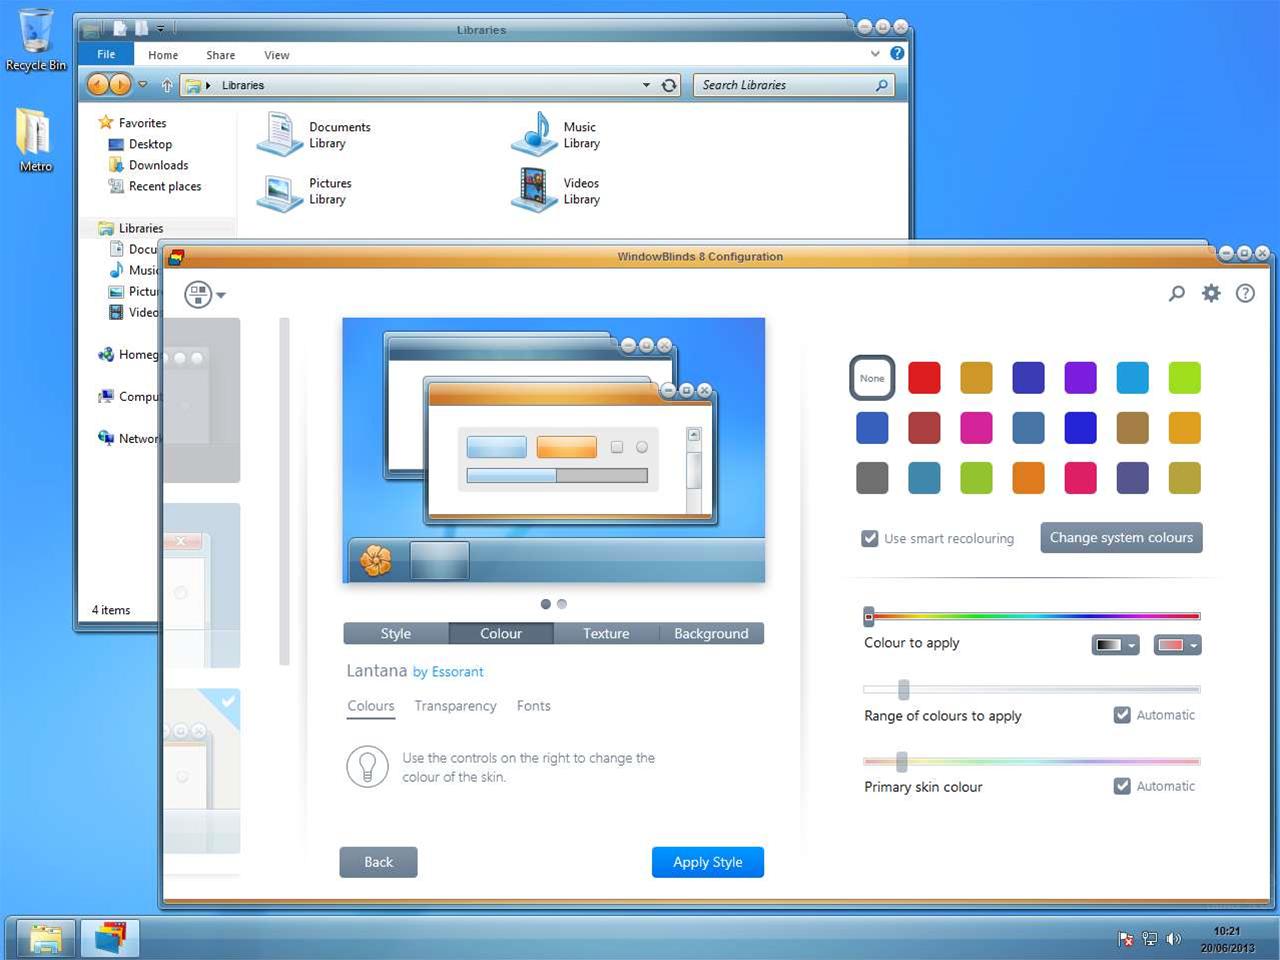 WindowBlinds 10.5 adds universal app skinning